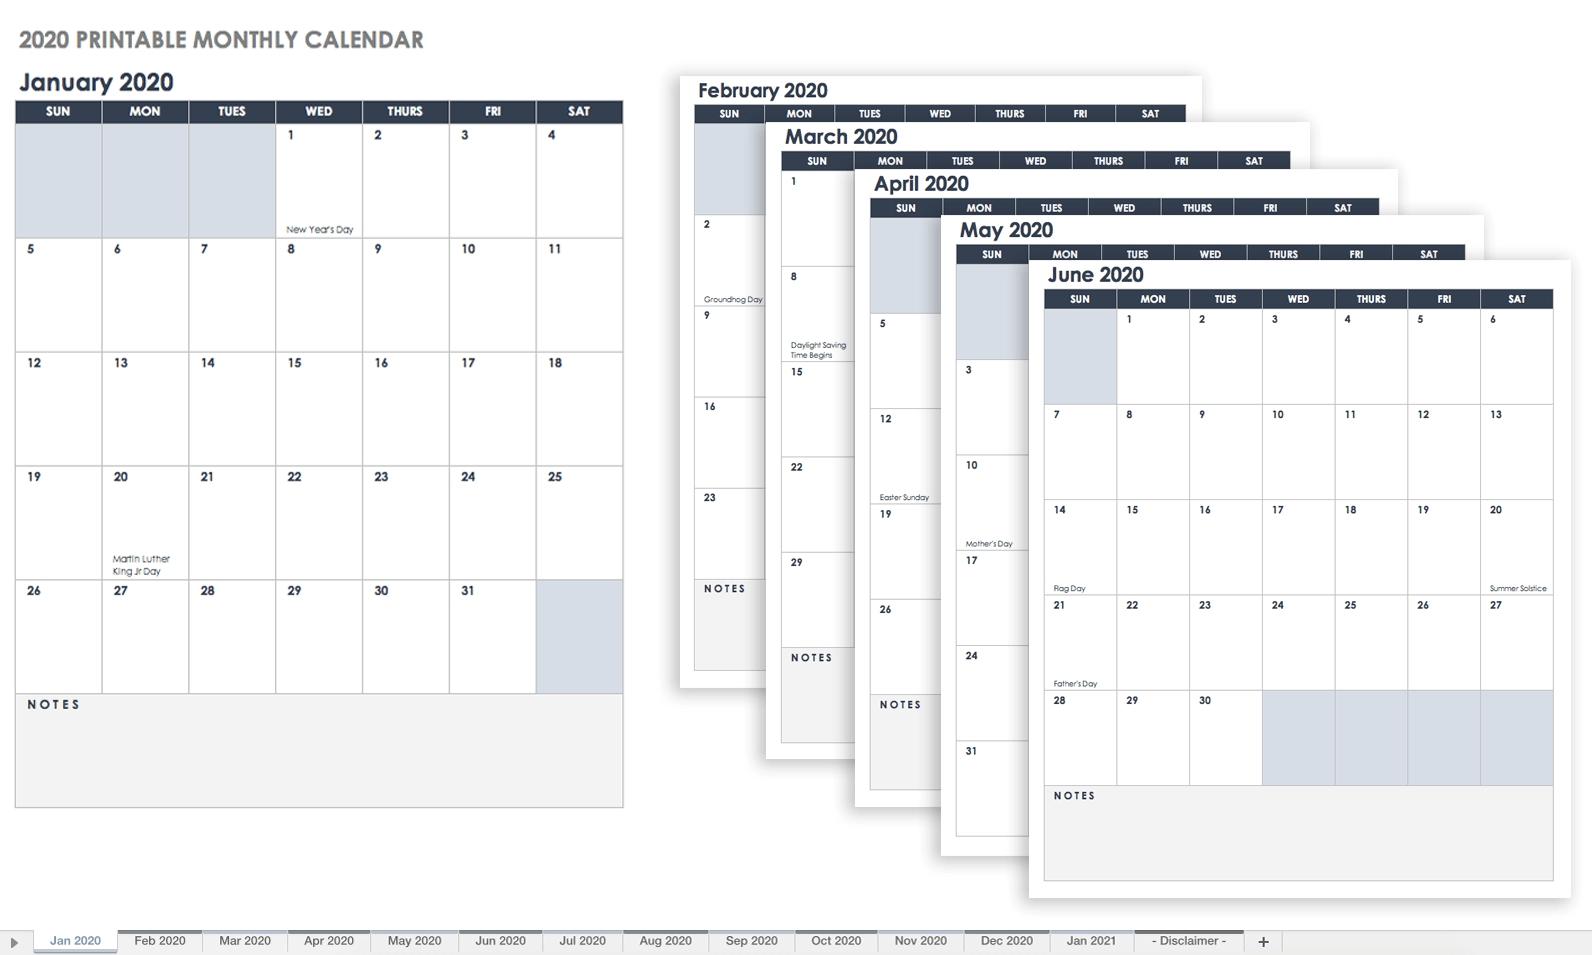 Free Blank Calendar Templates - Smartsheet in 9/80 2020 Calendar